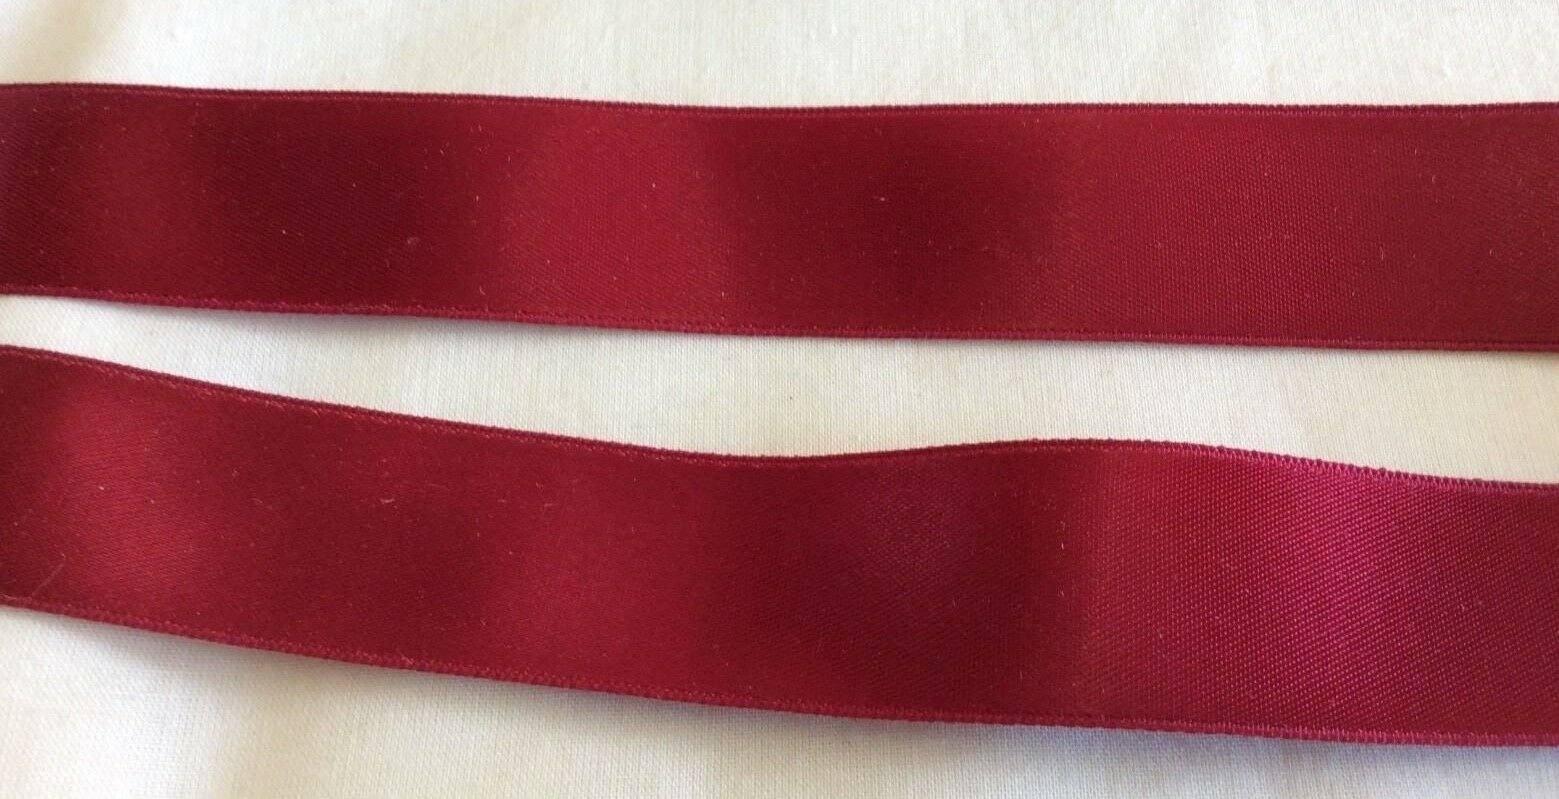 Grayblock Double Faced Satin Ribbon in Wine